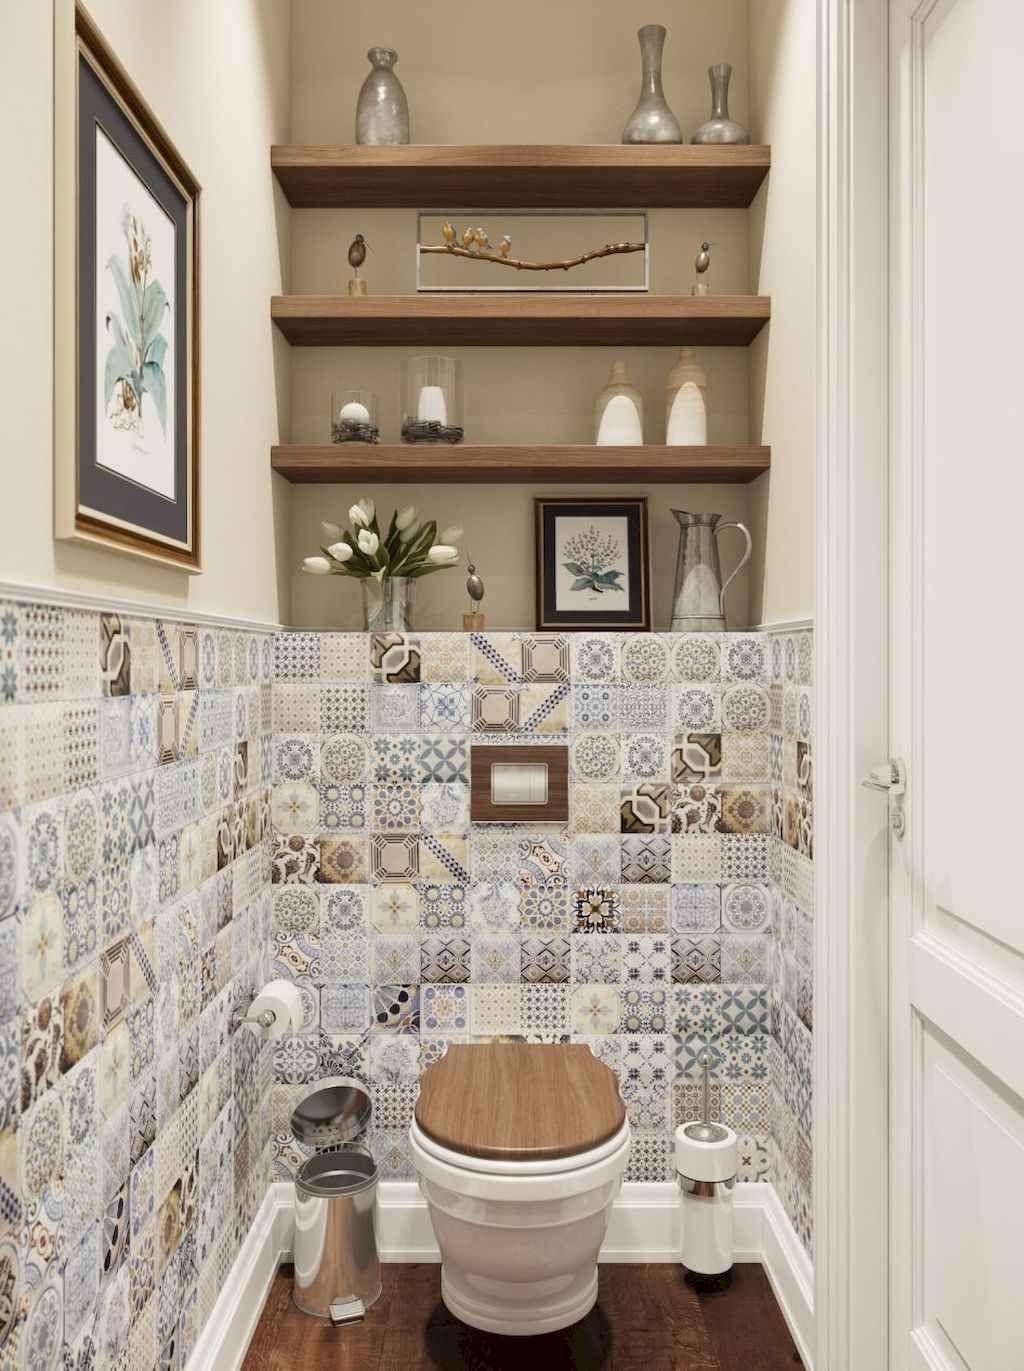 75 Rustic Farmhouse Bathroom Shelves Storage Ideas Page 64 Of 75 Chessy Decor Bathroom Wall Decor Trendy Bathroom Bathroom Interior Bathroom wall decor ideas